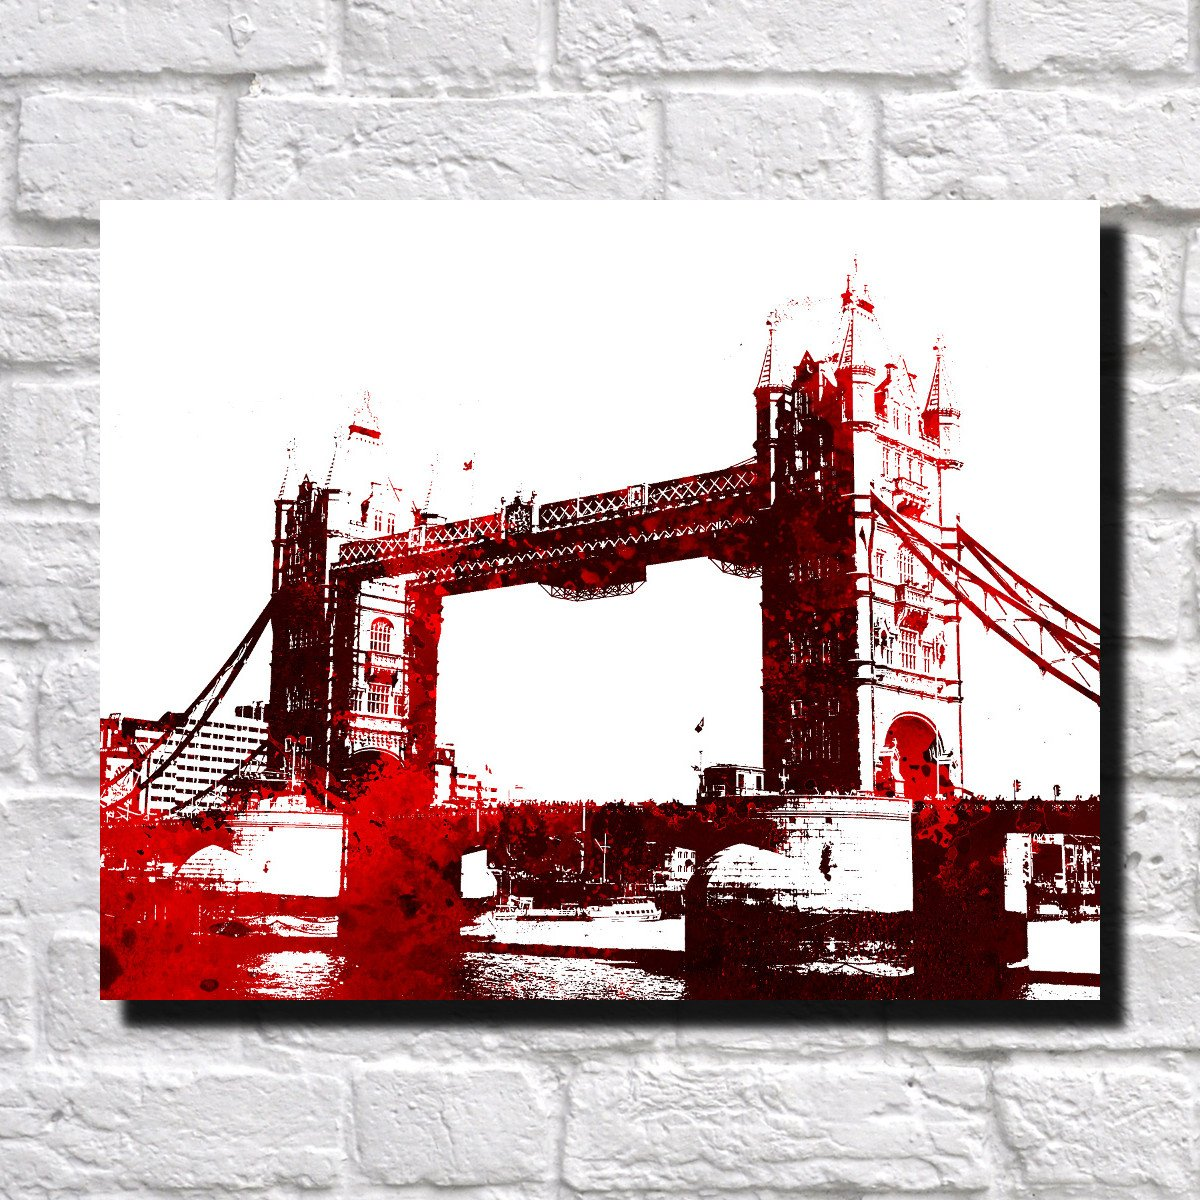 Tower Bridge London City Skyline Print Landscape Poster Feature Wall Art Unmissable! #wallart #towerbridge #londonbridge http://bit.ly/2Pc46X2